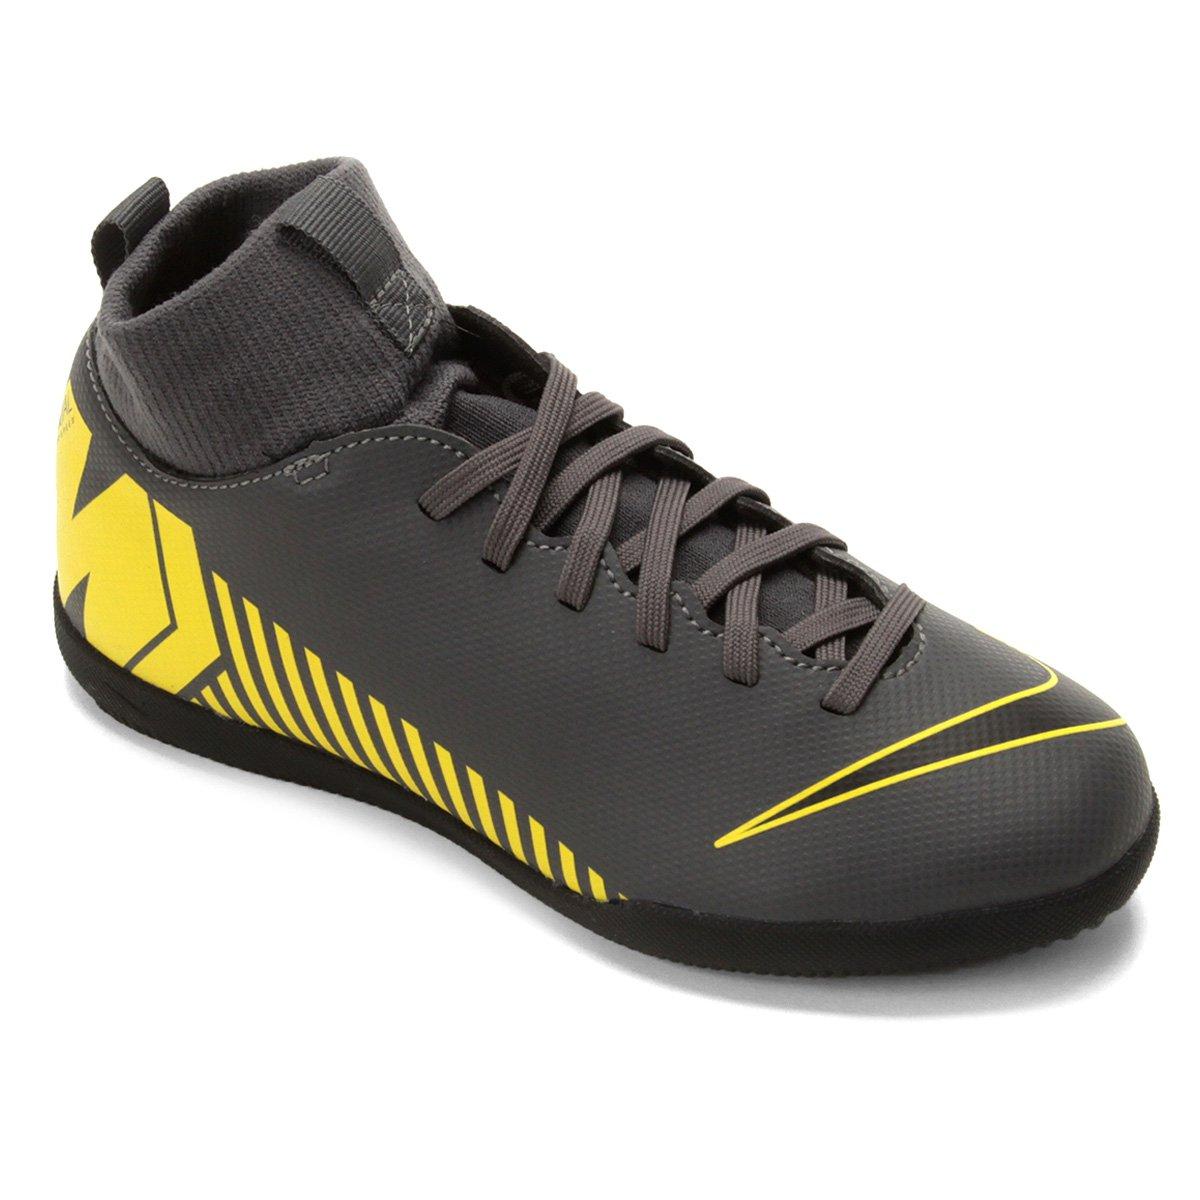 78d36fa79c66a Chuteira Futsal Infantil Nike Mercurial Superfly 6 Club IC - Cinza e  Amarelo | Loja do Inter